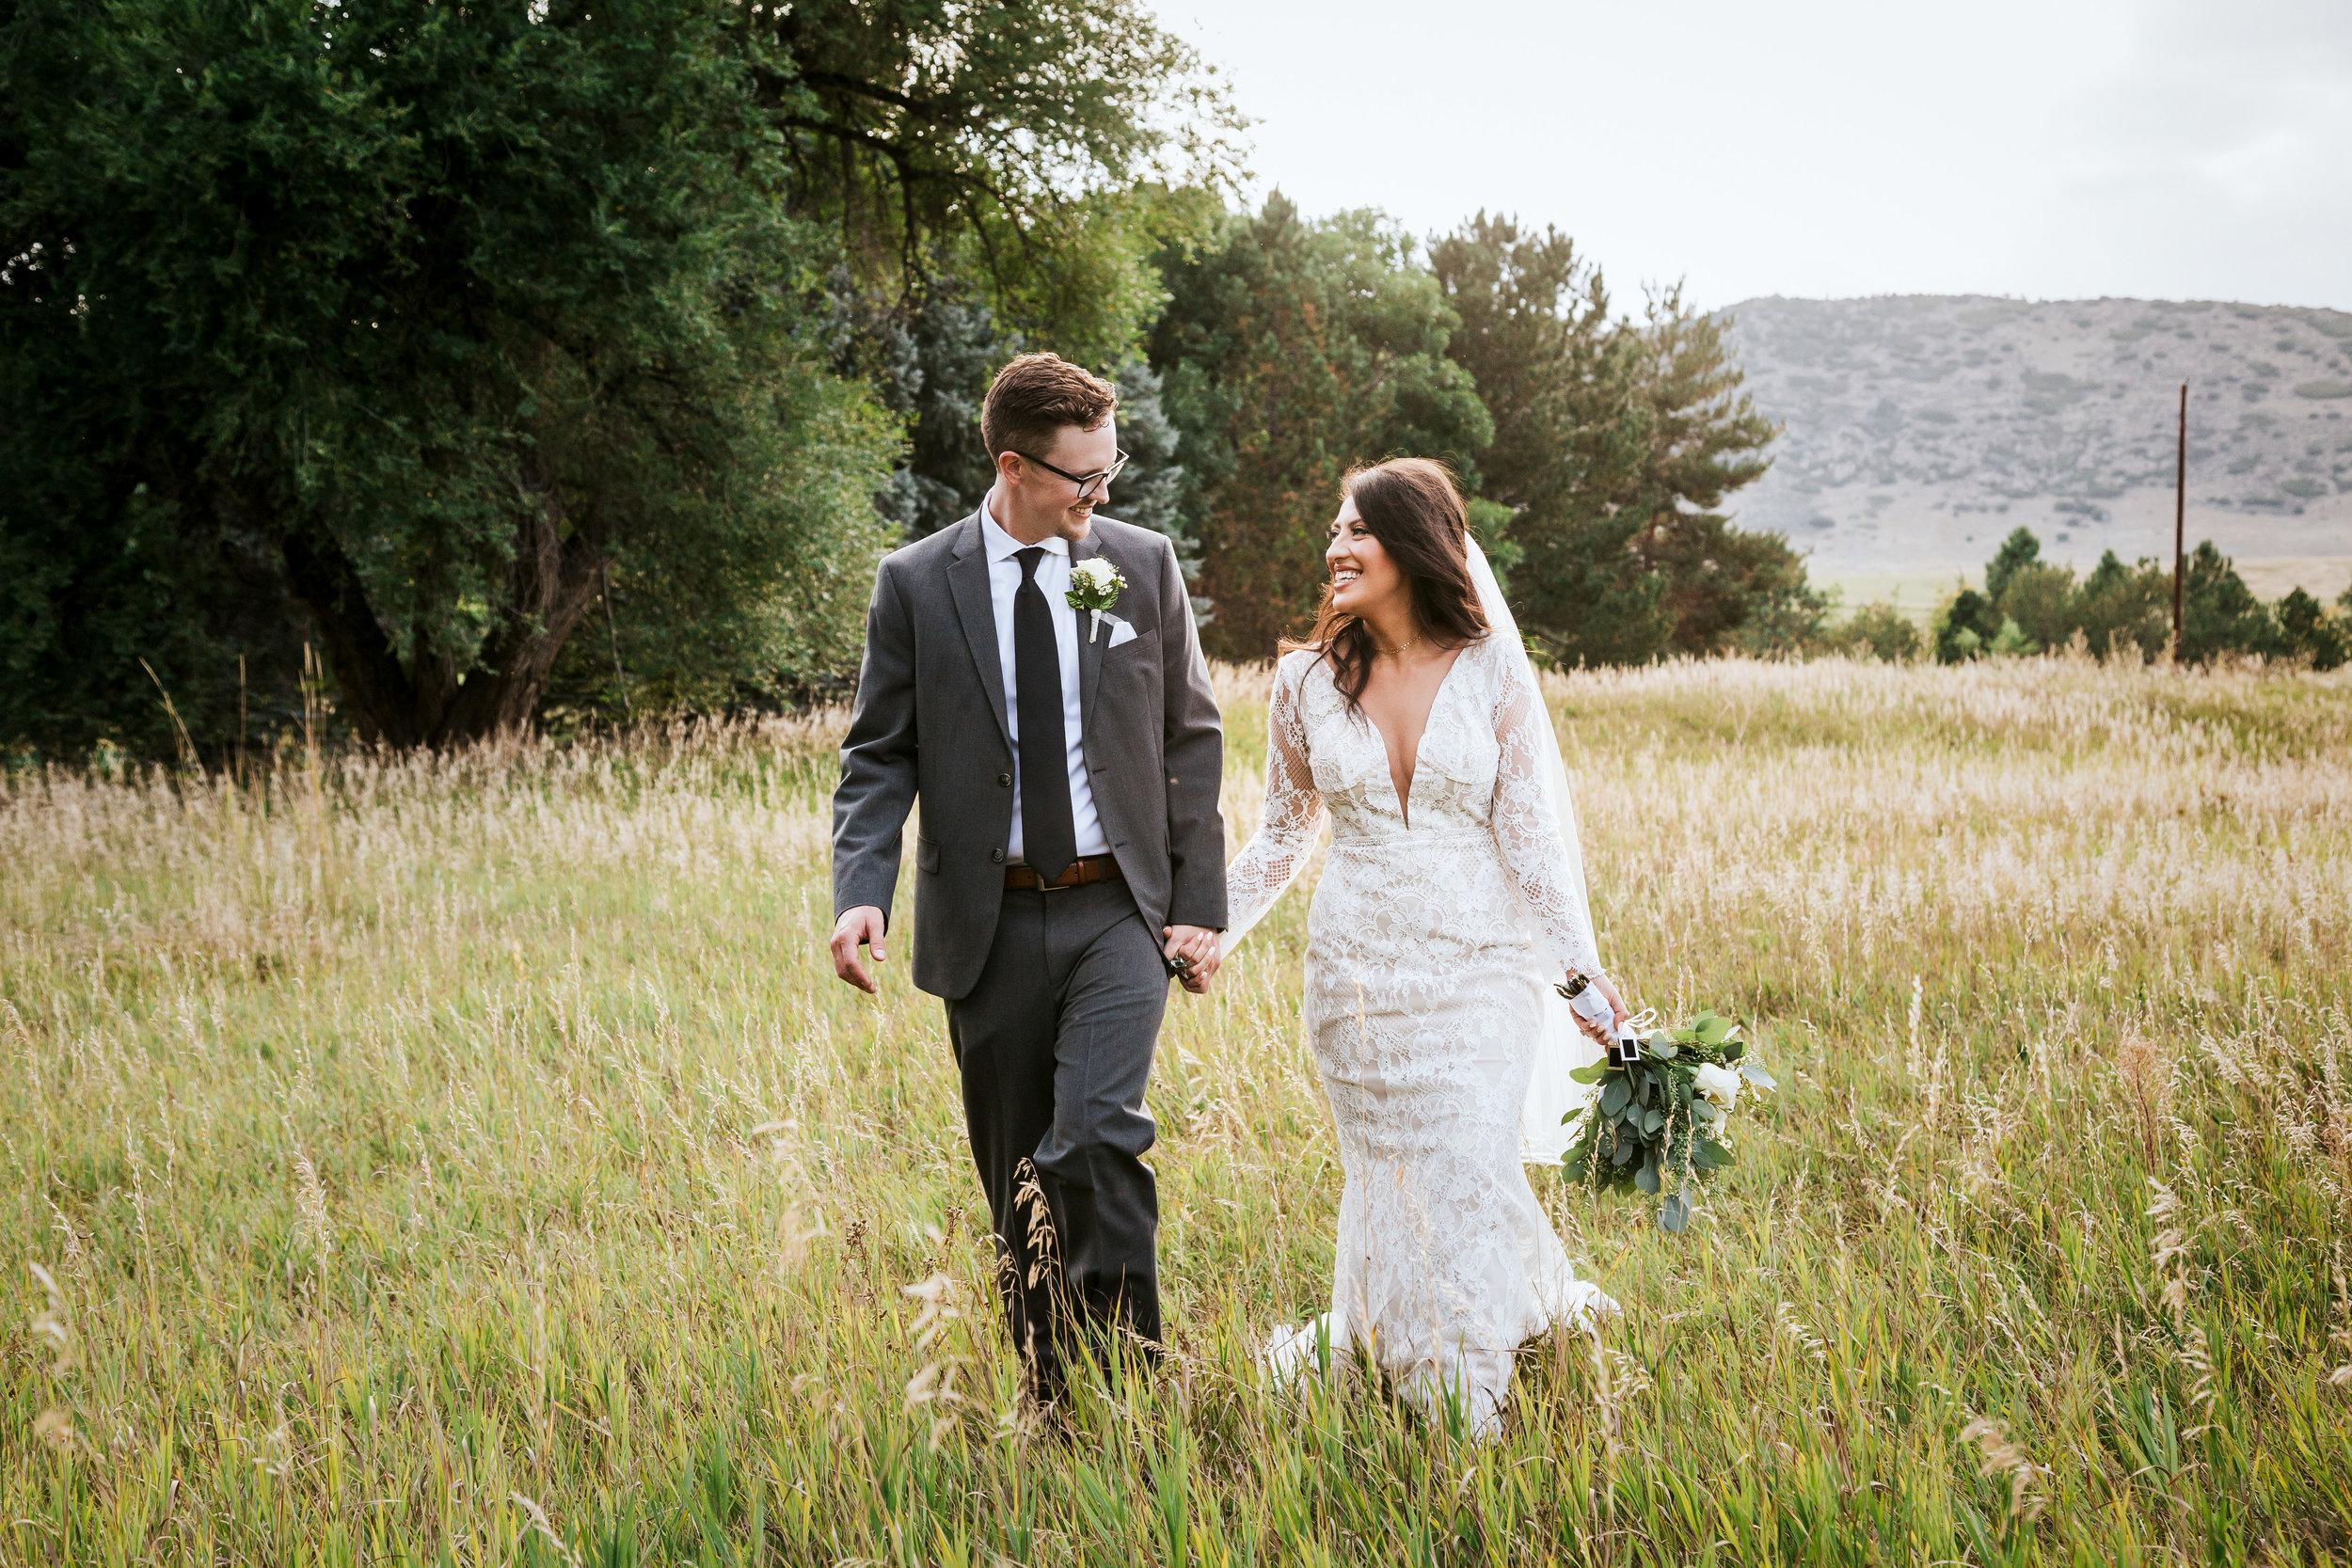 Chase-Annalise-Bontanic Gardens-Chatfield-Denver-Wedding-178.JPG